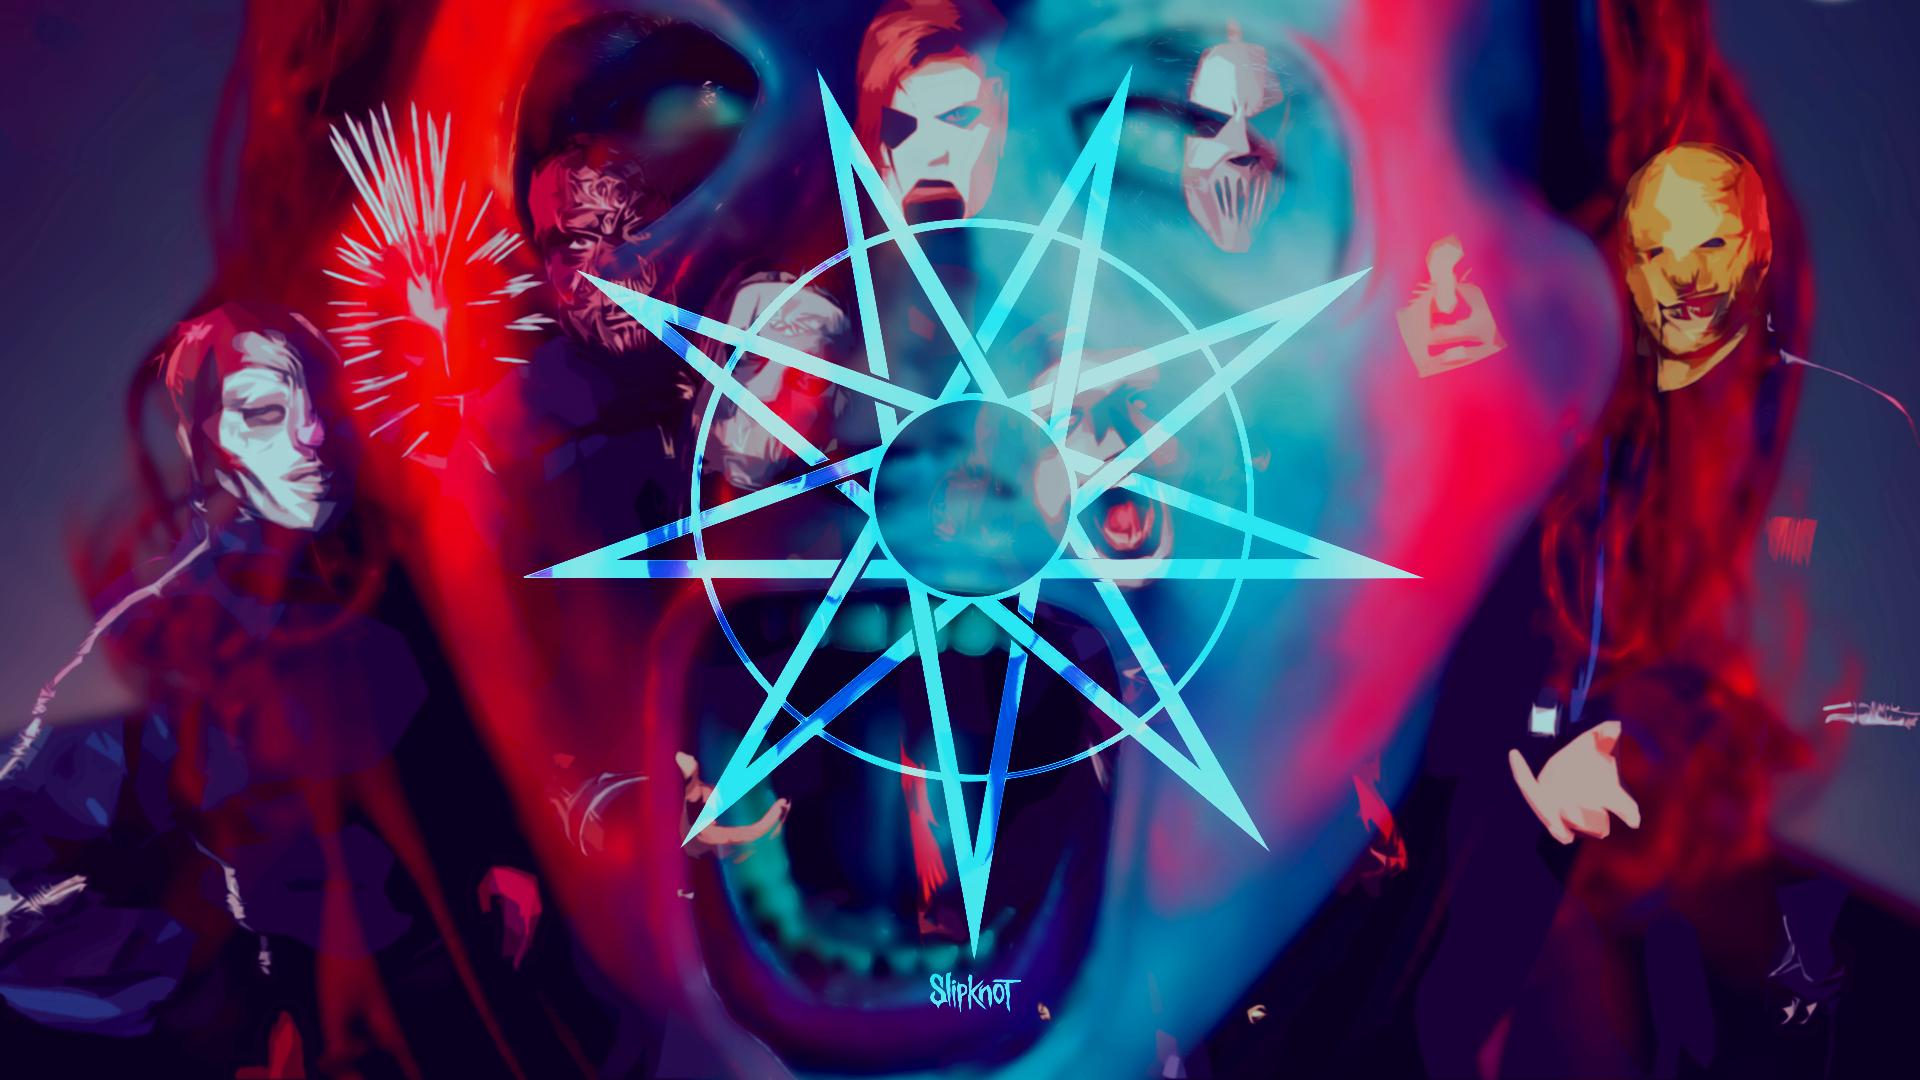 Slipknot WANYK 2019 Corey Taylor 1080P wallpaper